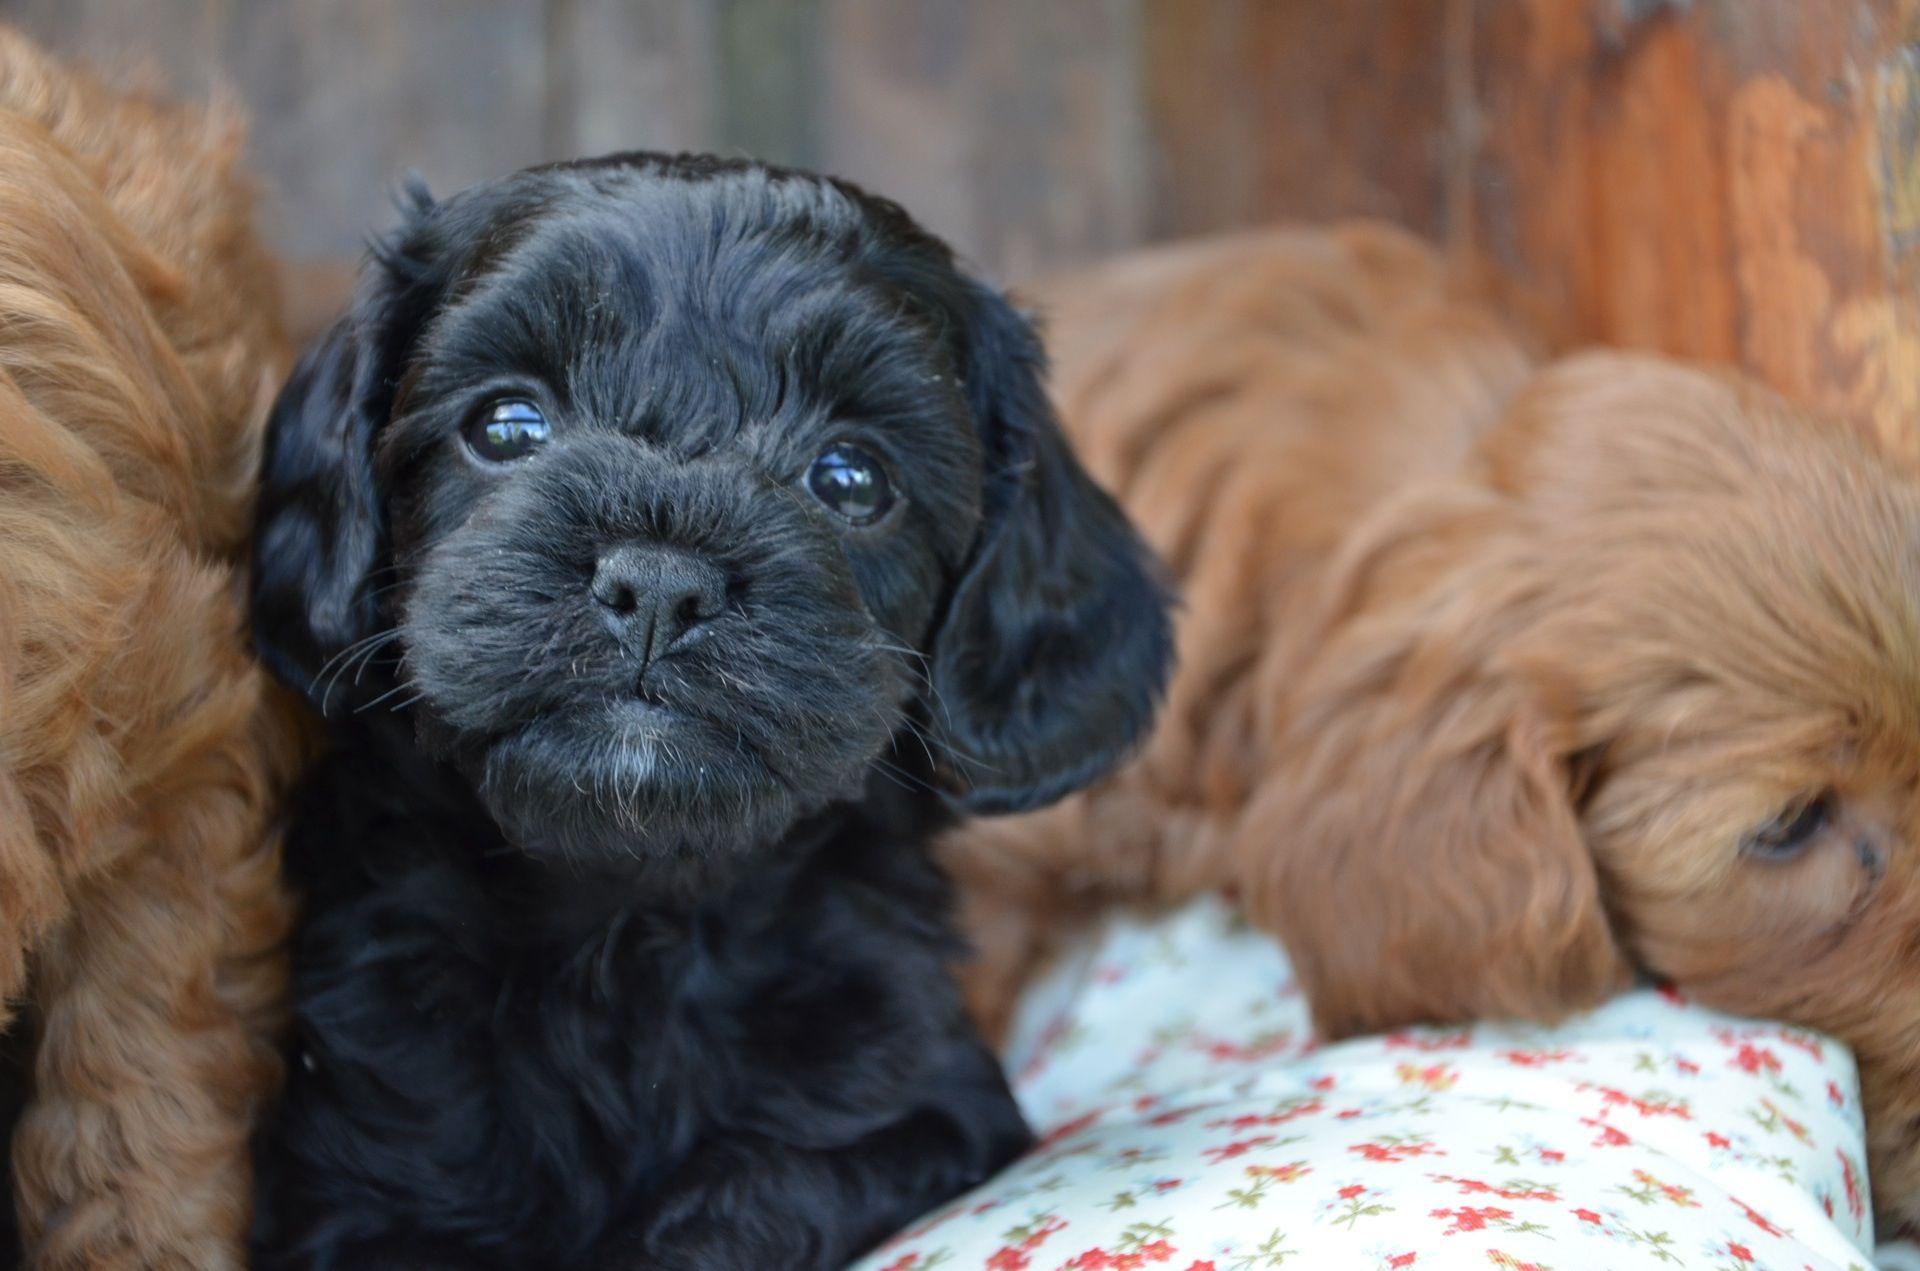 Little Black Cavoodle Cute Dogs Breeds Teacup Dog Breeds Puppies